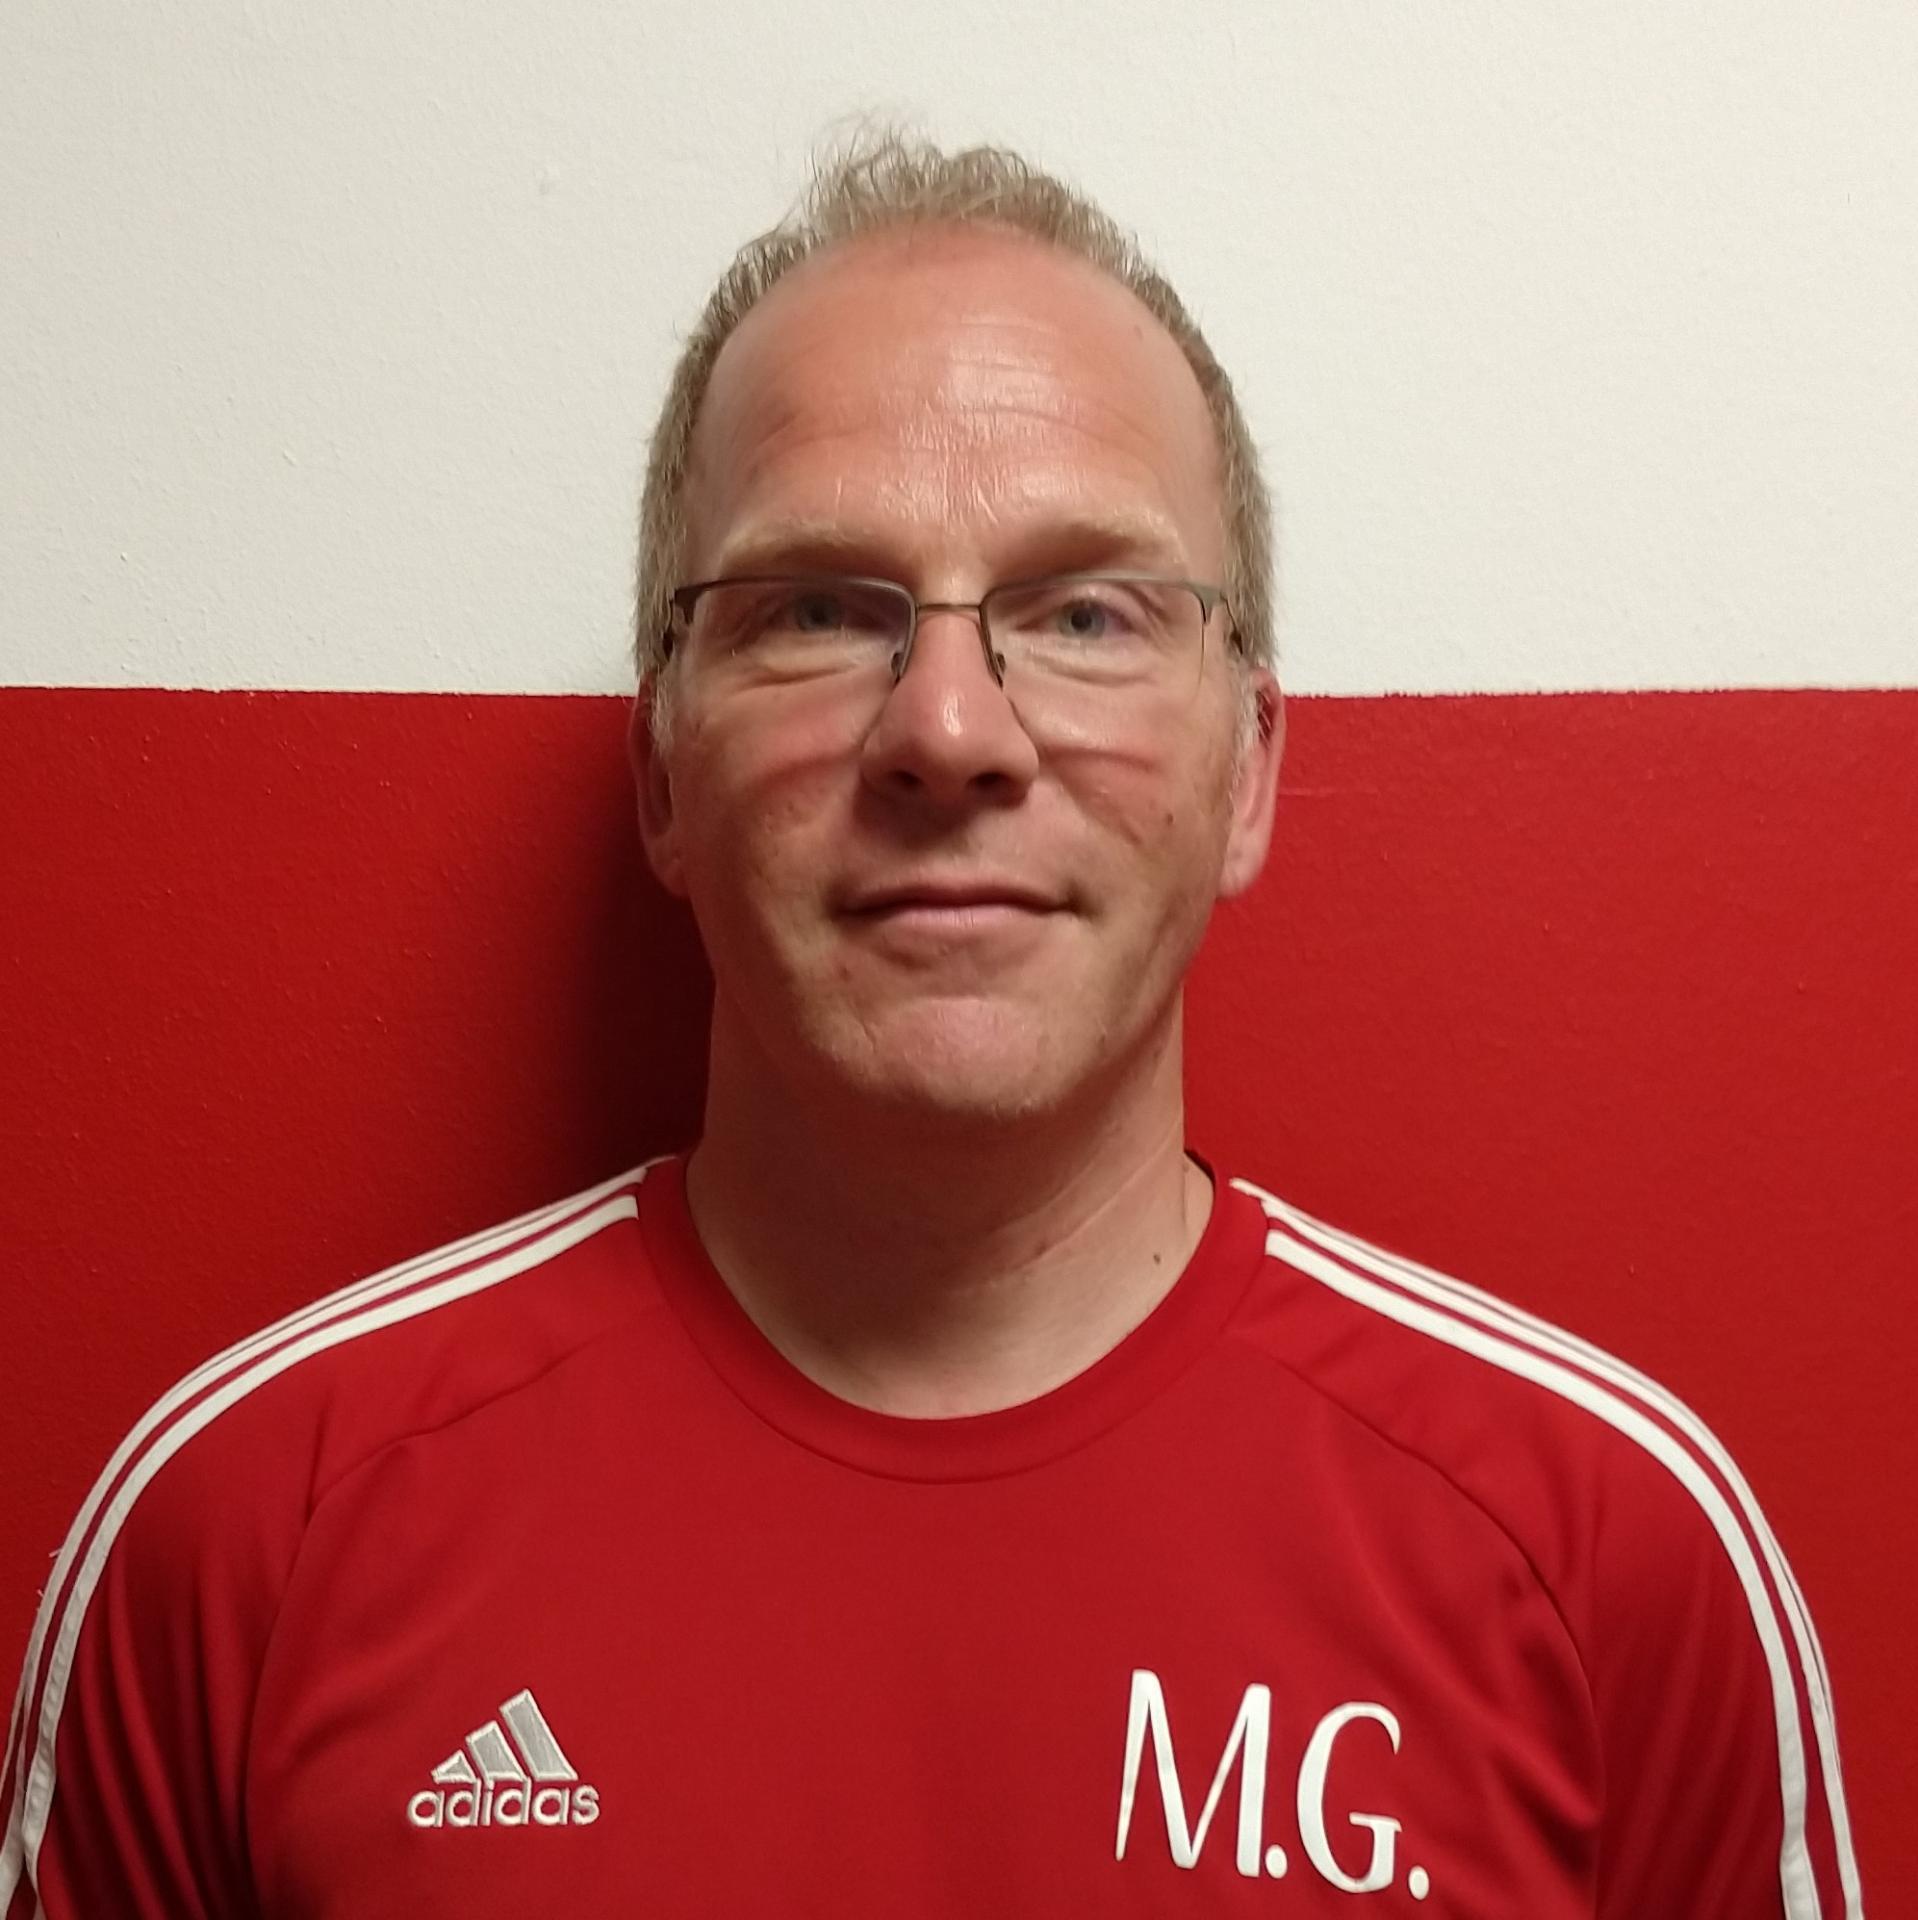 Martin Gakis